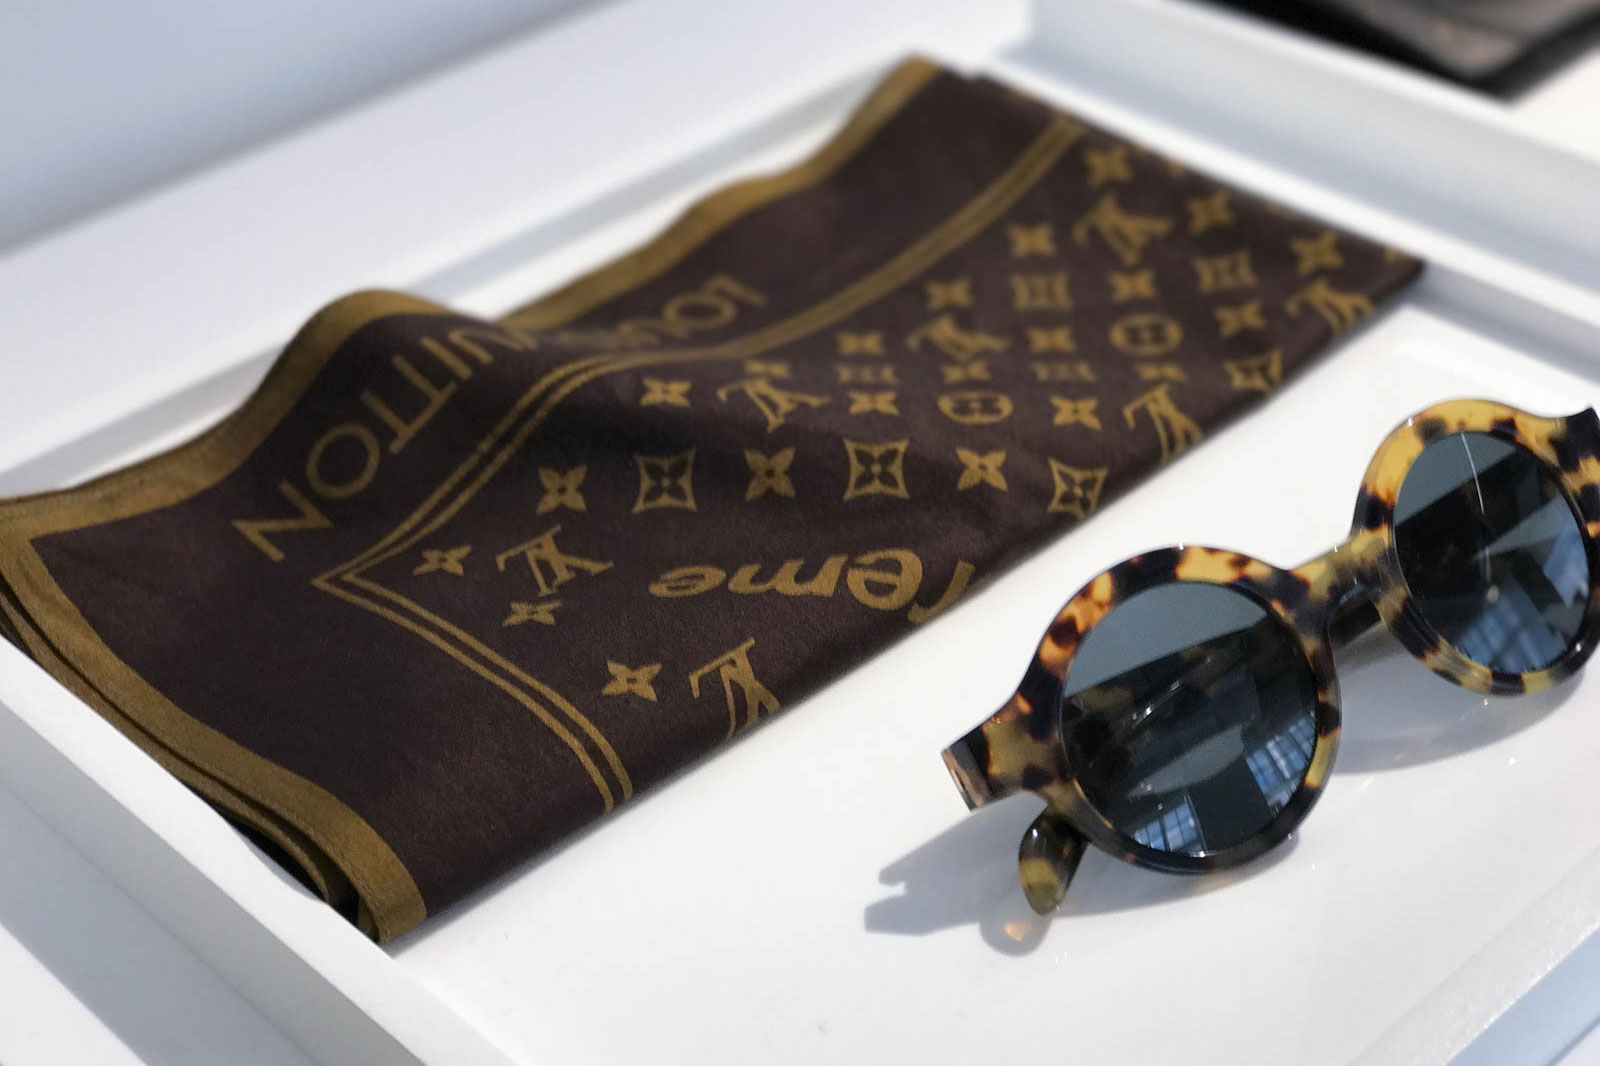 Supreme x Louis Vuitton 2017 Fall/Winter Closer Look Showroom - 3703538